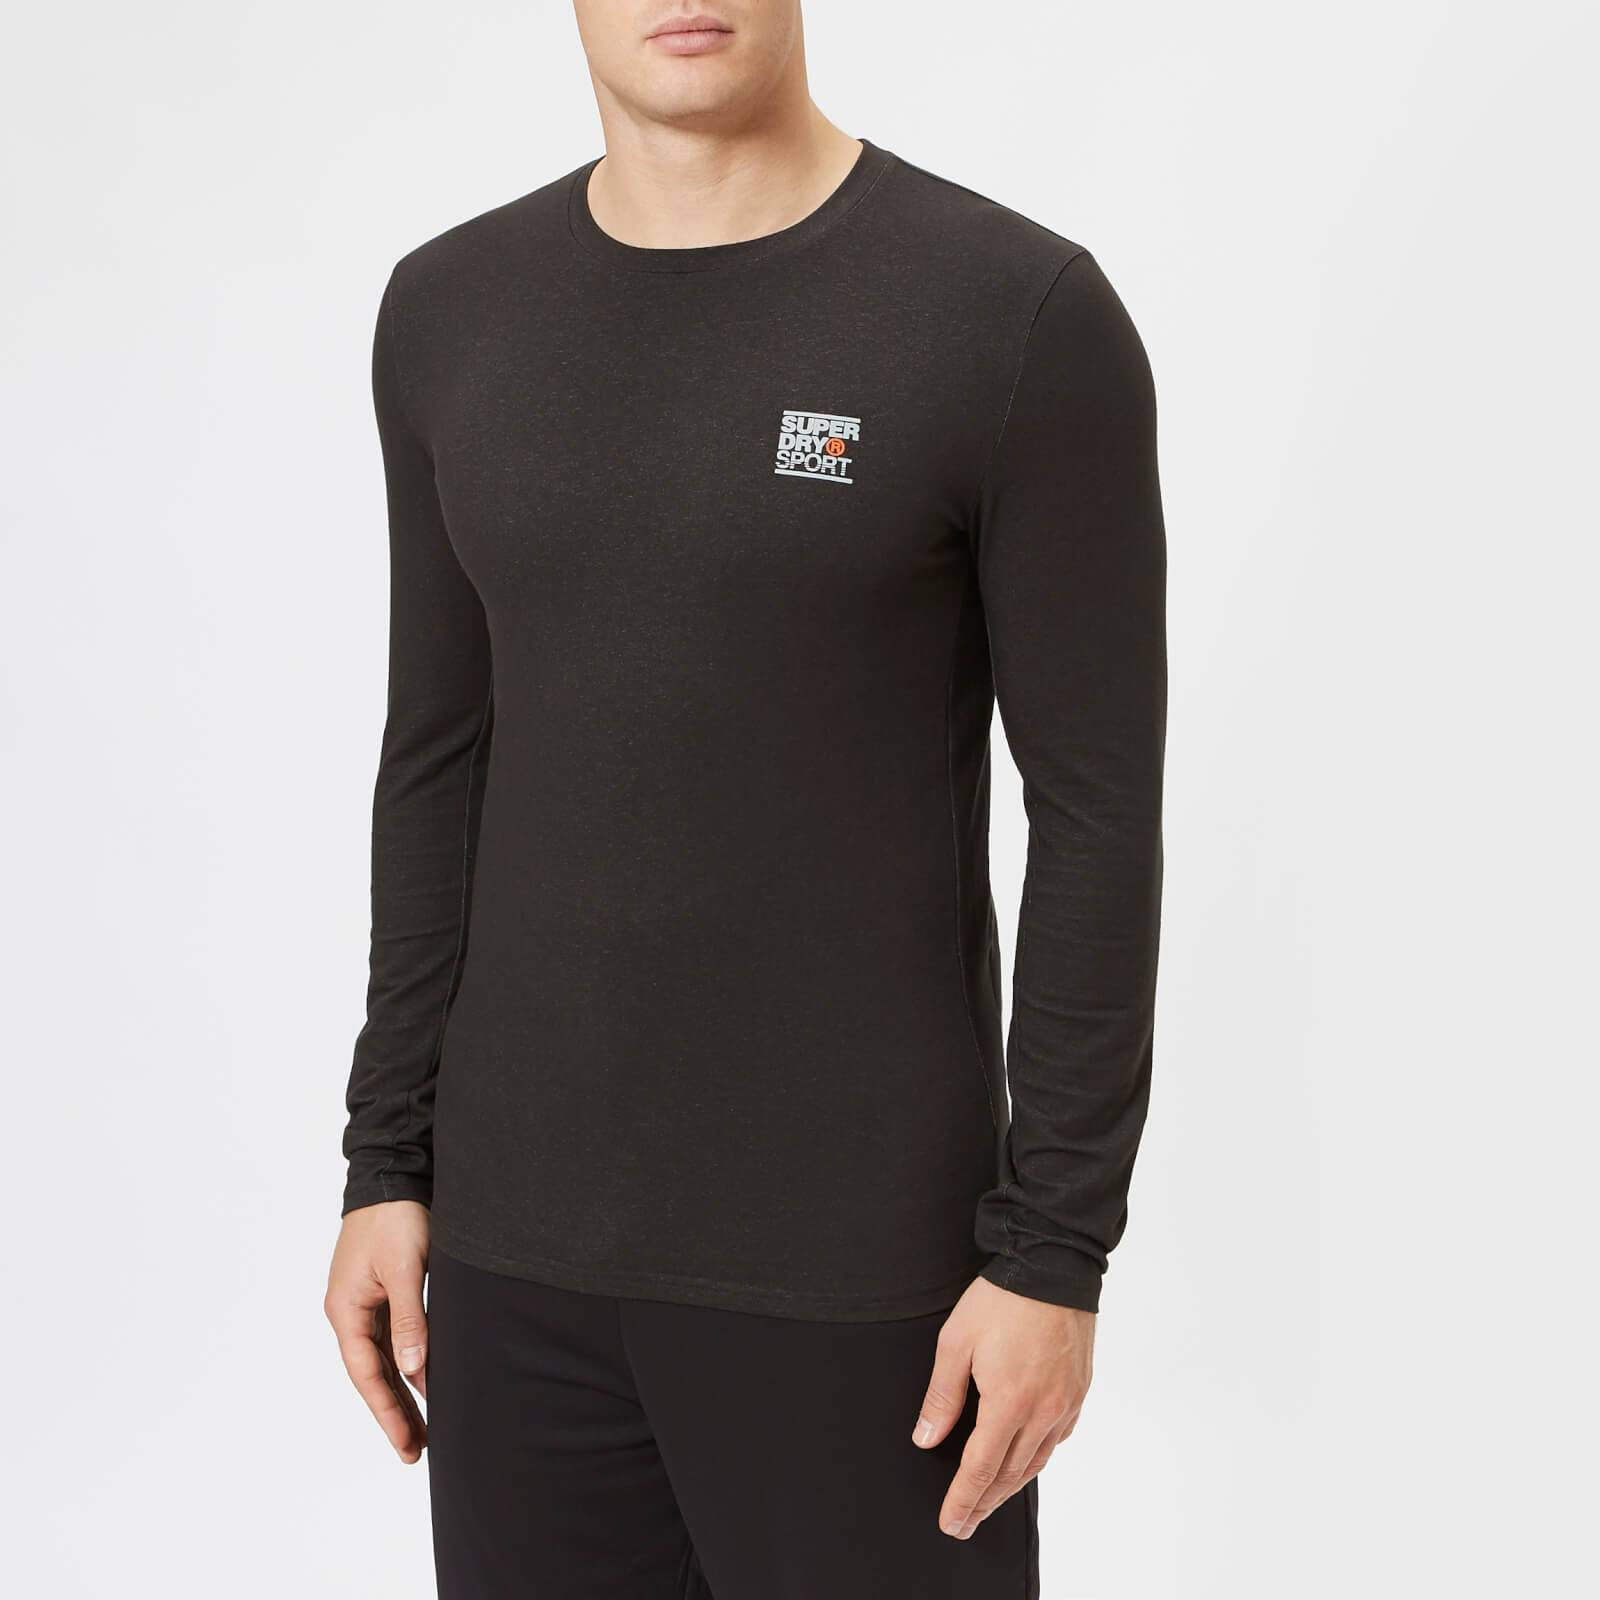 Superdry Sport Men's Core Long Sleeve Sign Off T-Shirt - Black - XL - Black